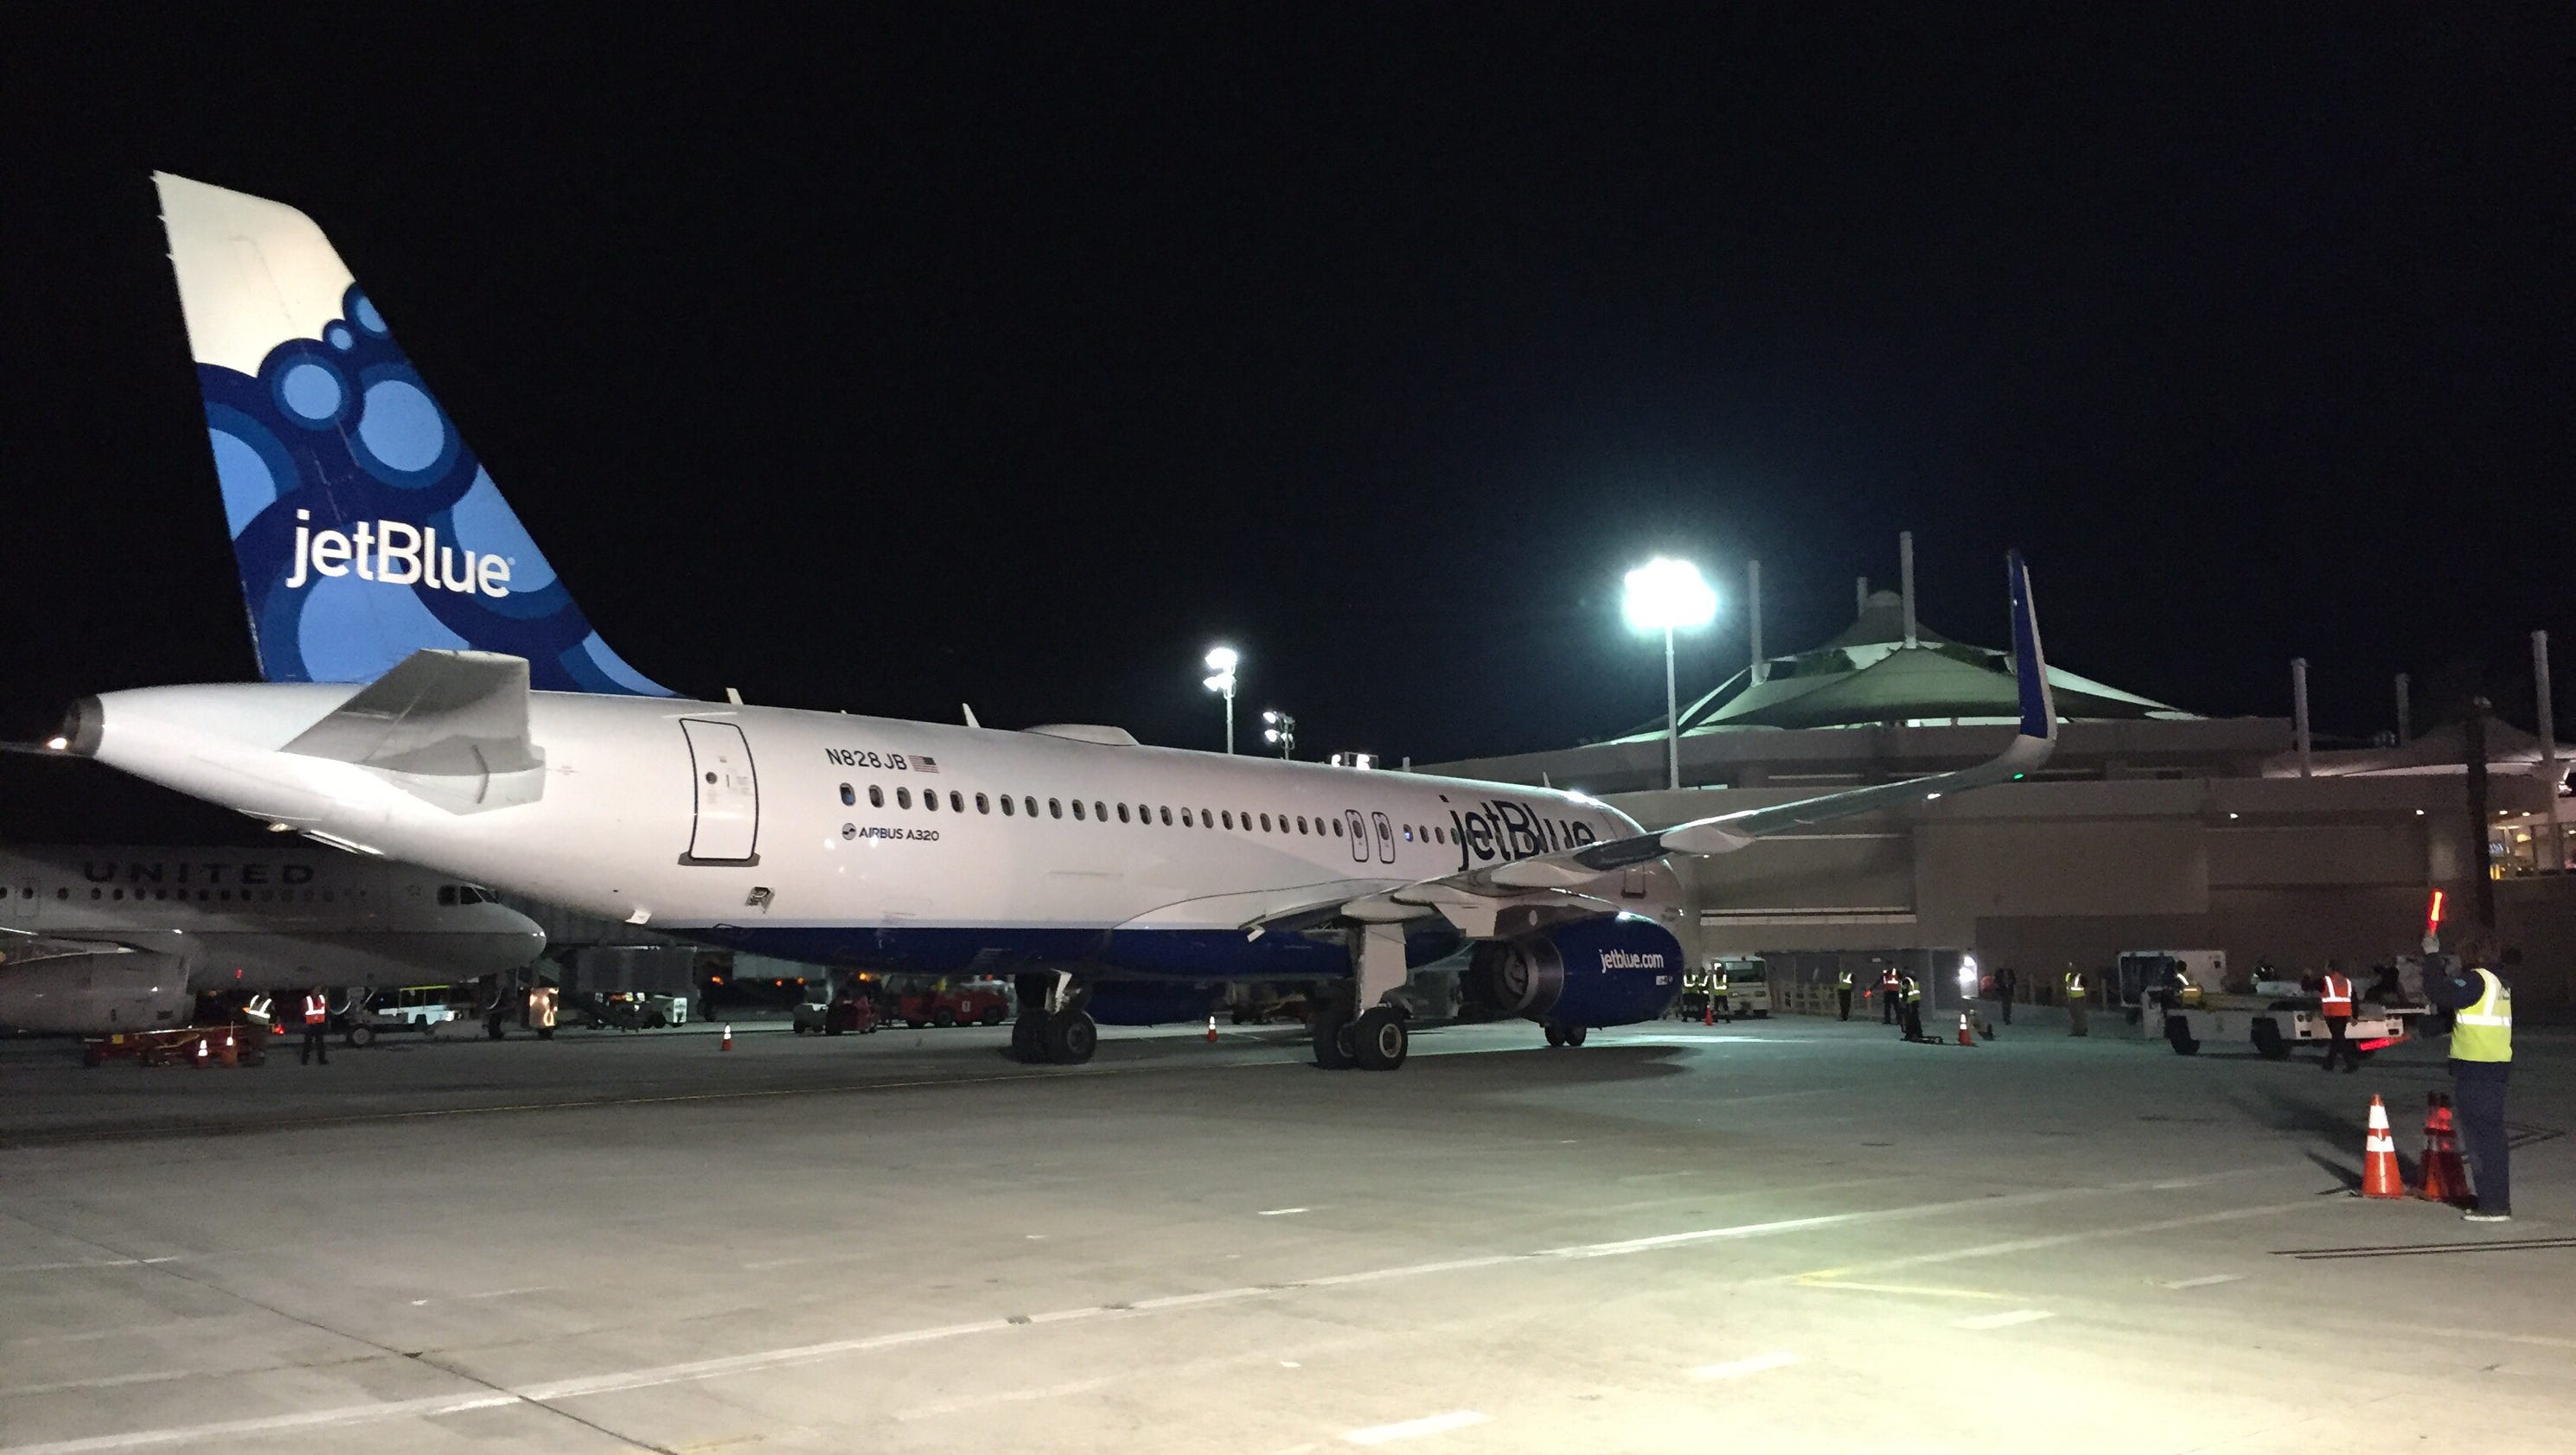 JetBlue arrives in Palm Springs